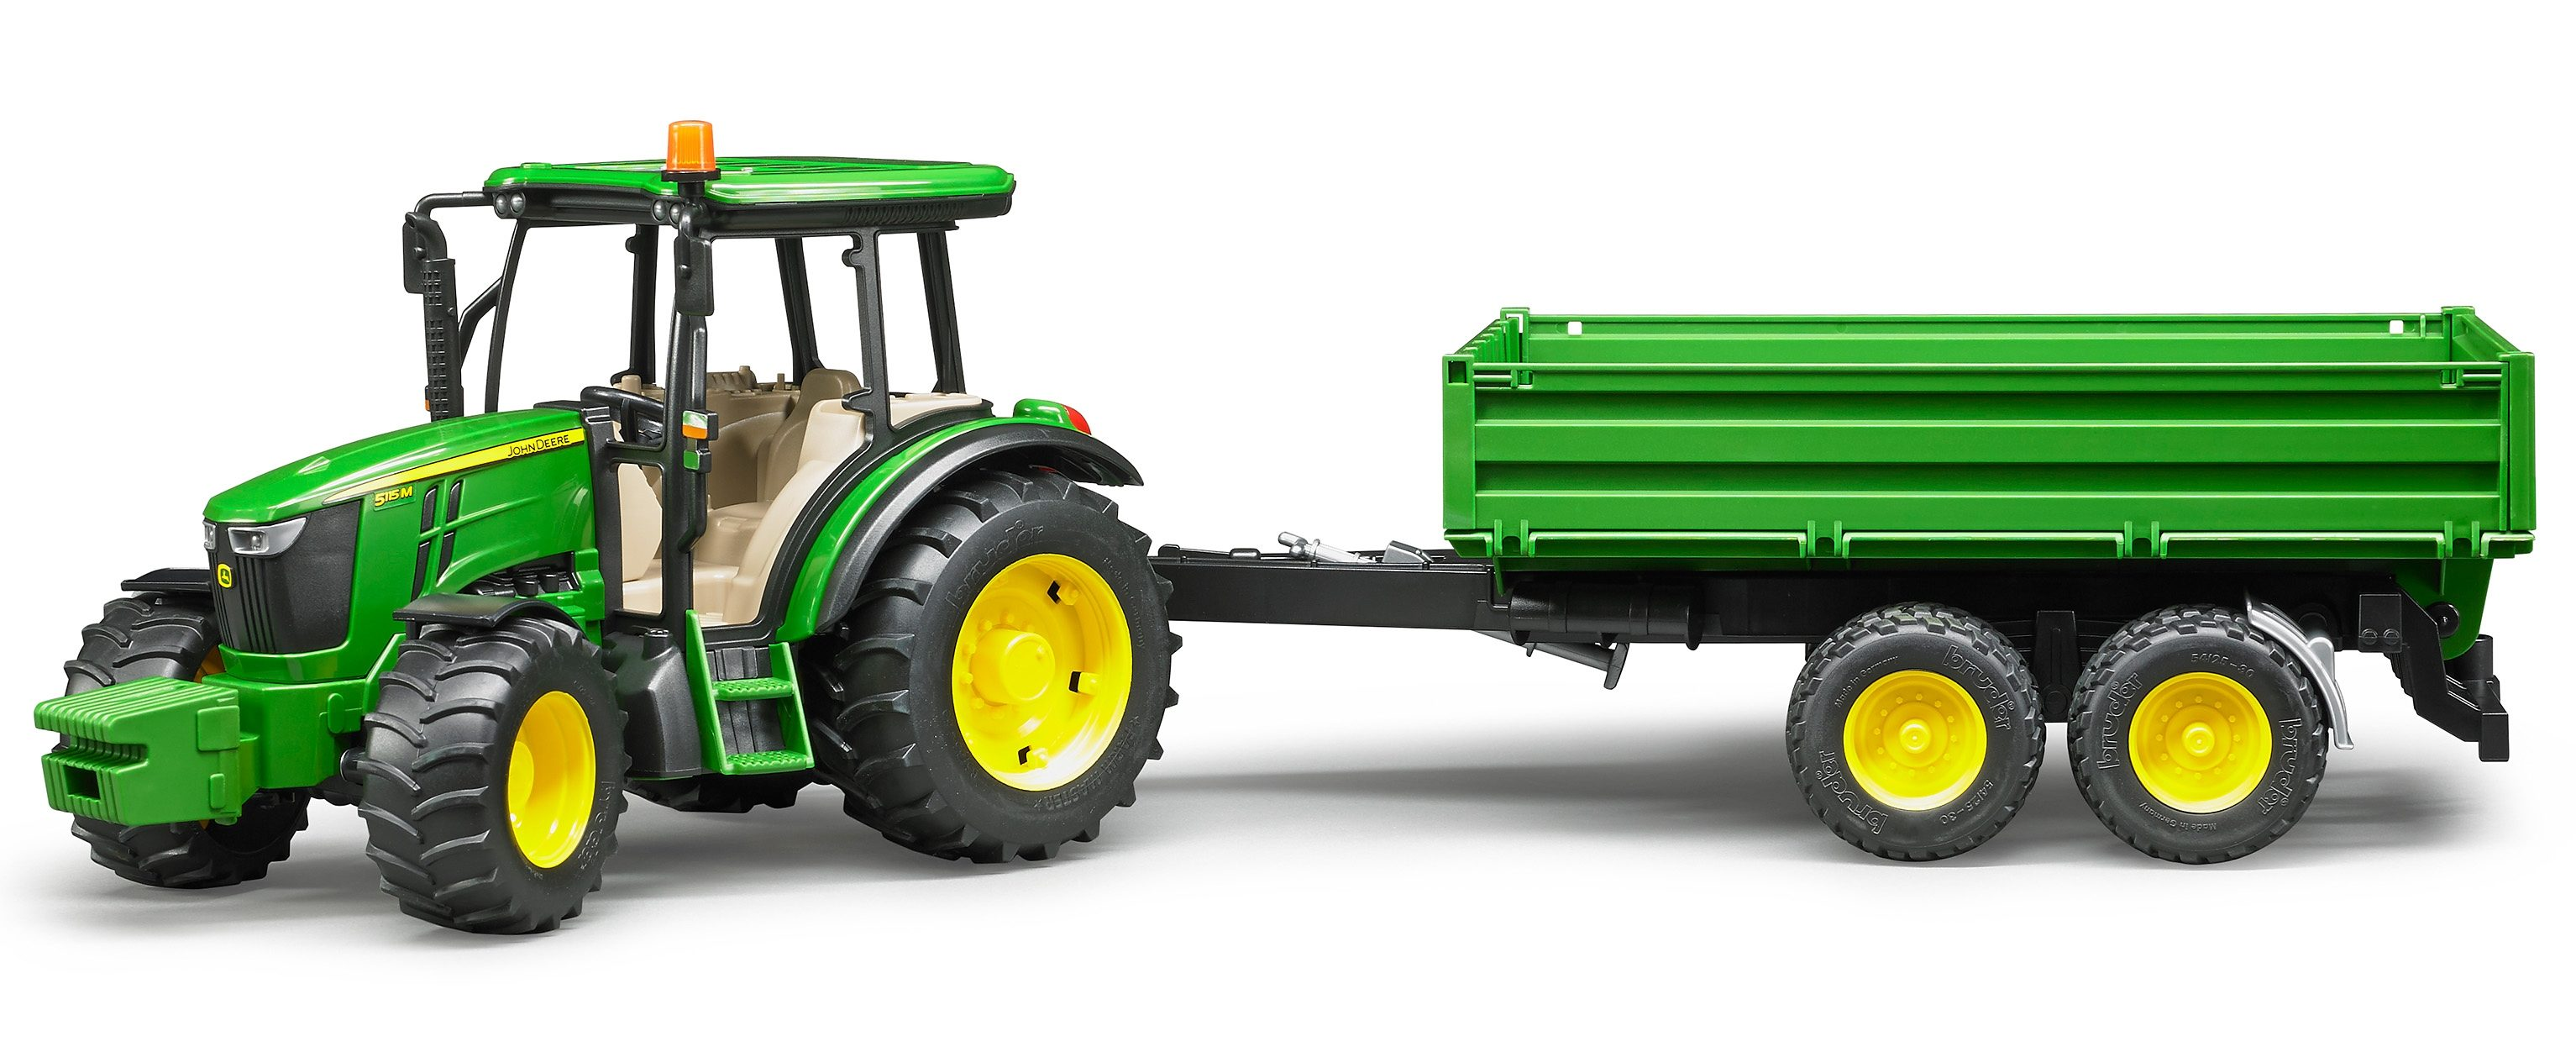 bruder® Traktor mit Anhänger 02108, »John Deere 5115M mit Bordwandanhänger«